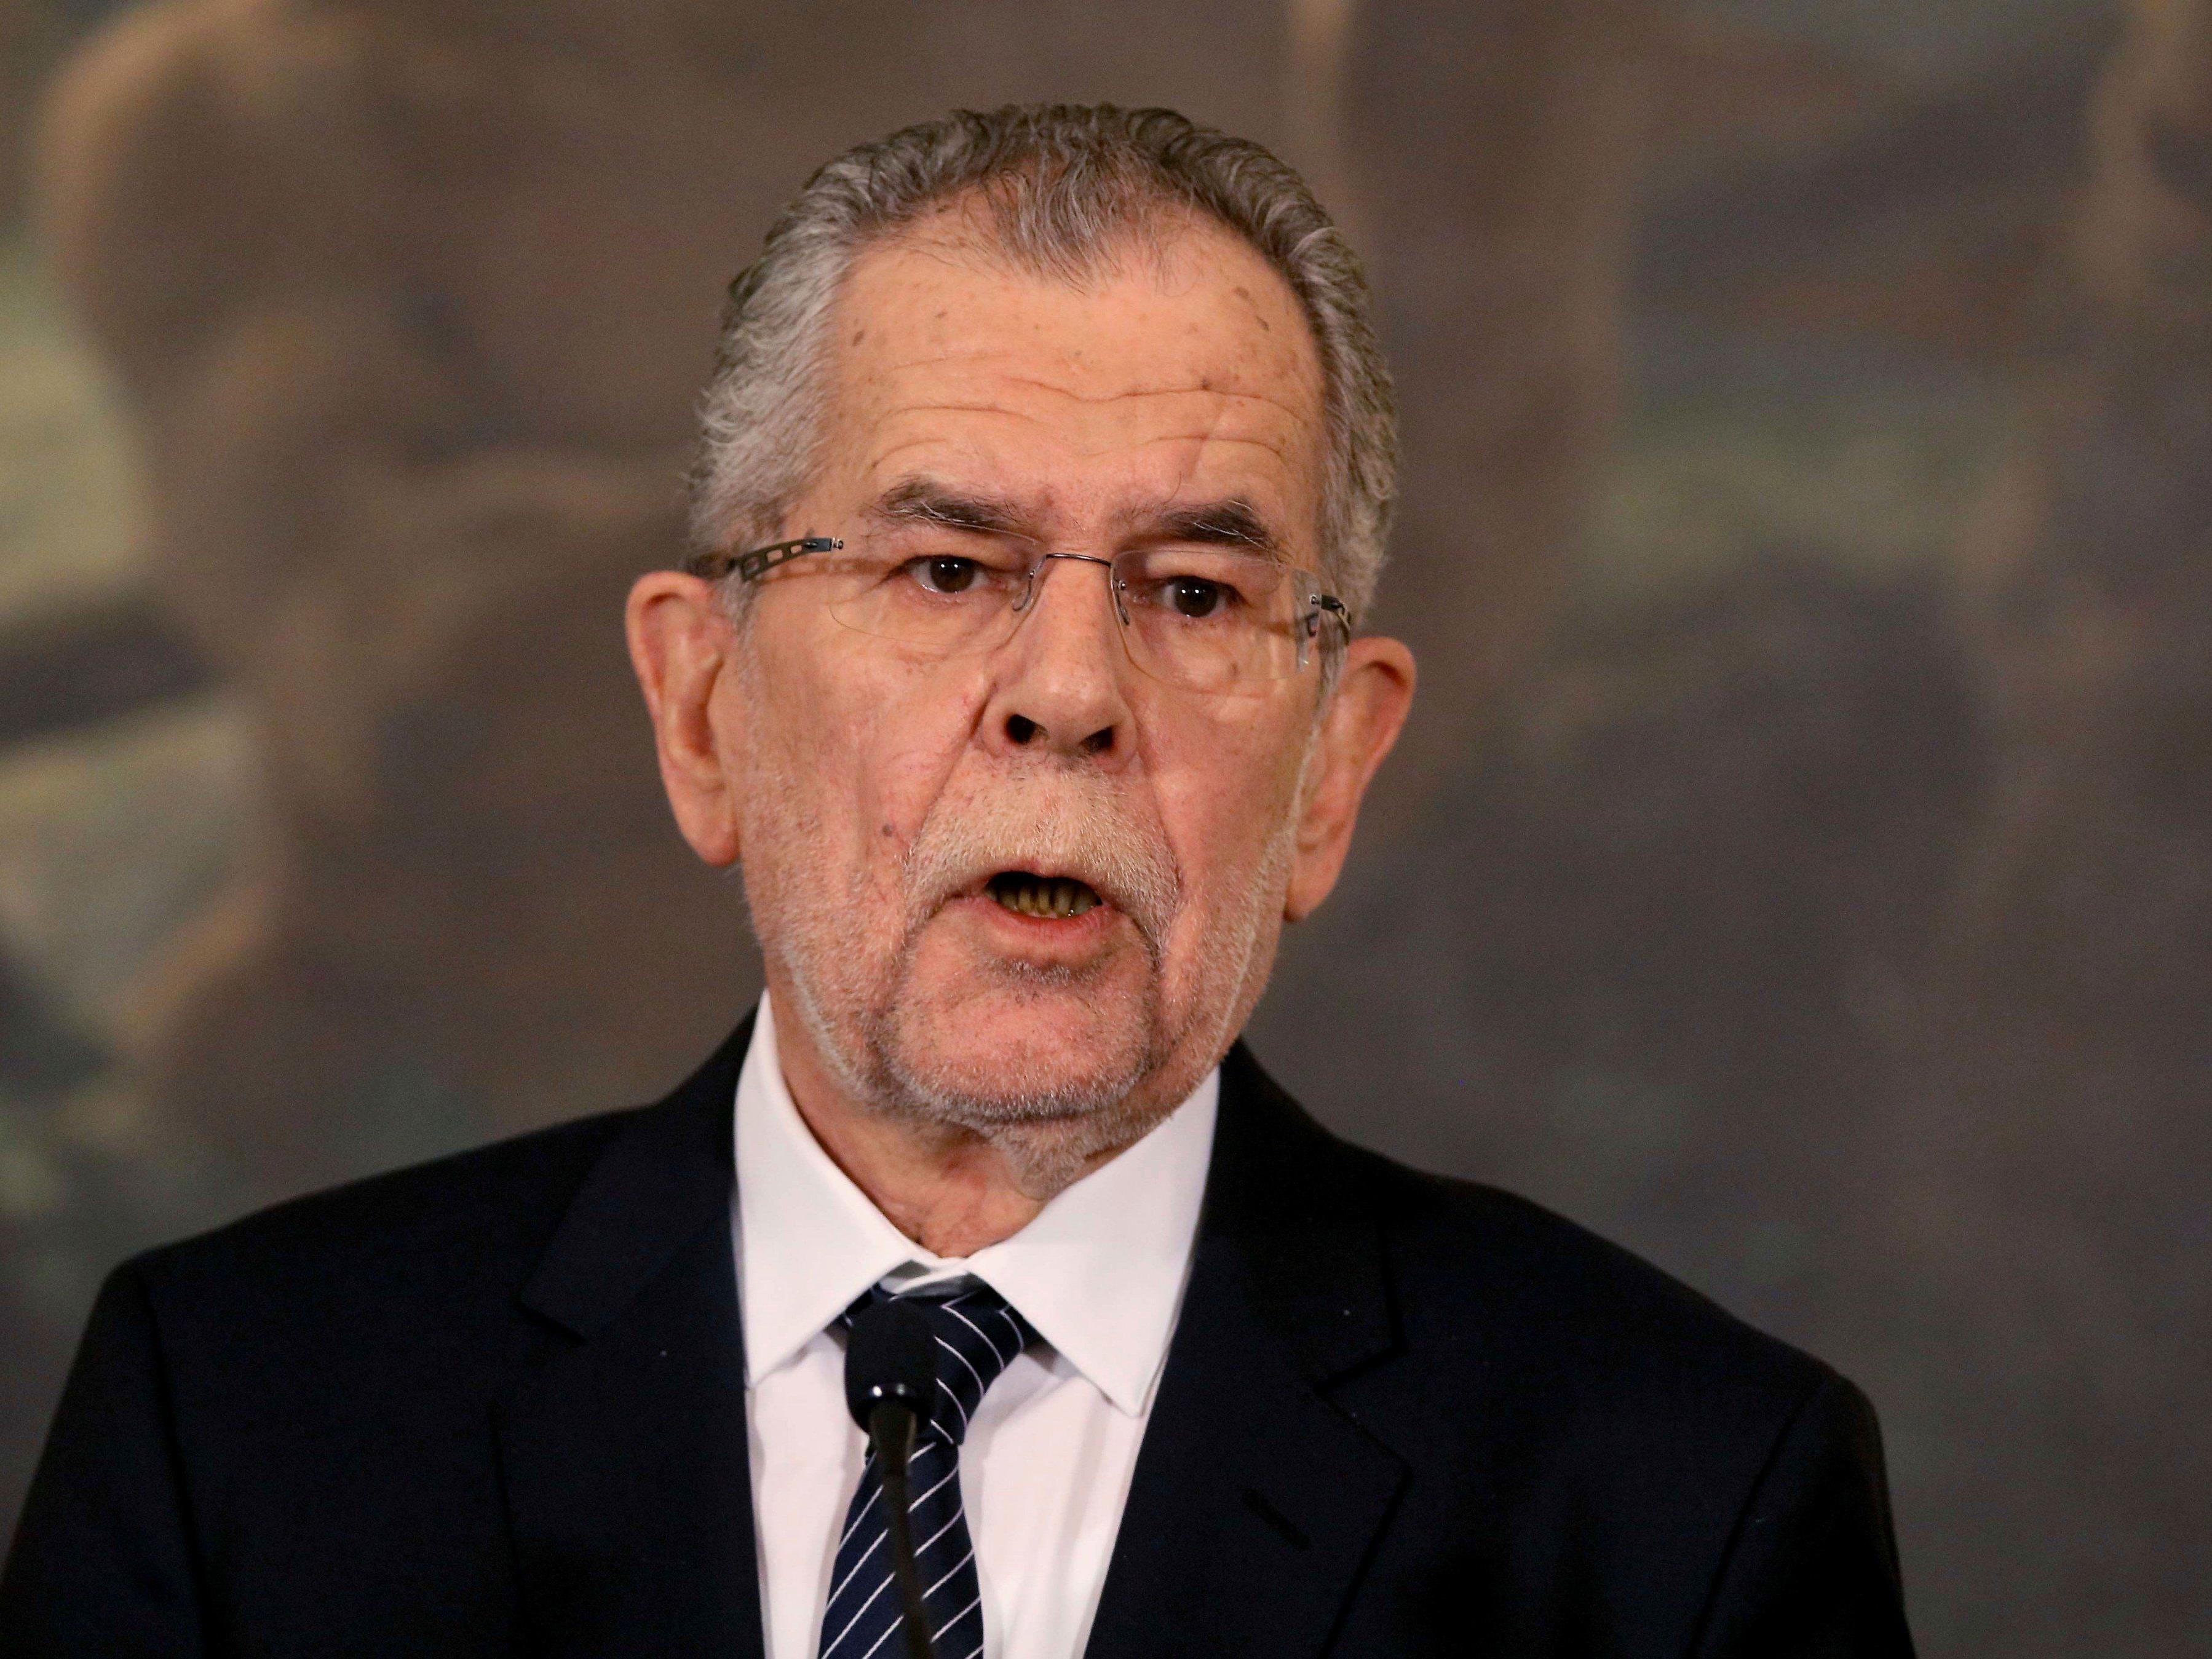 Alexander Van der Bellen wird am Donnerstag als Bundespräsident angelobt